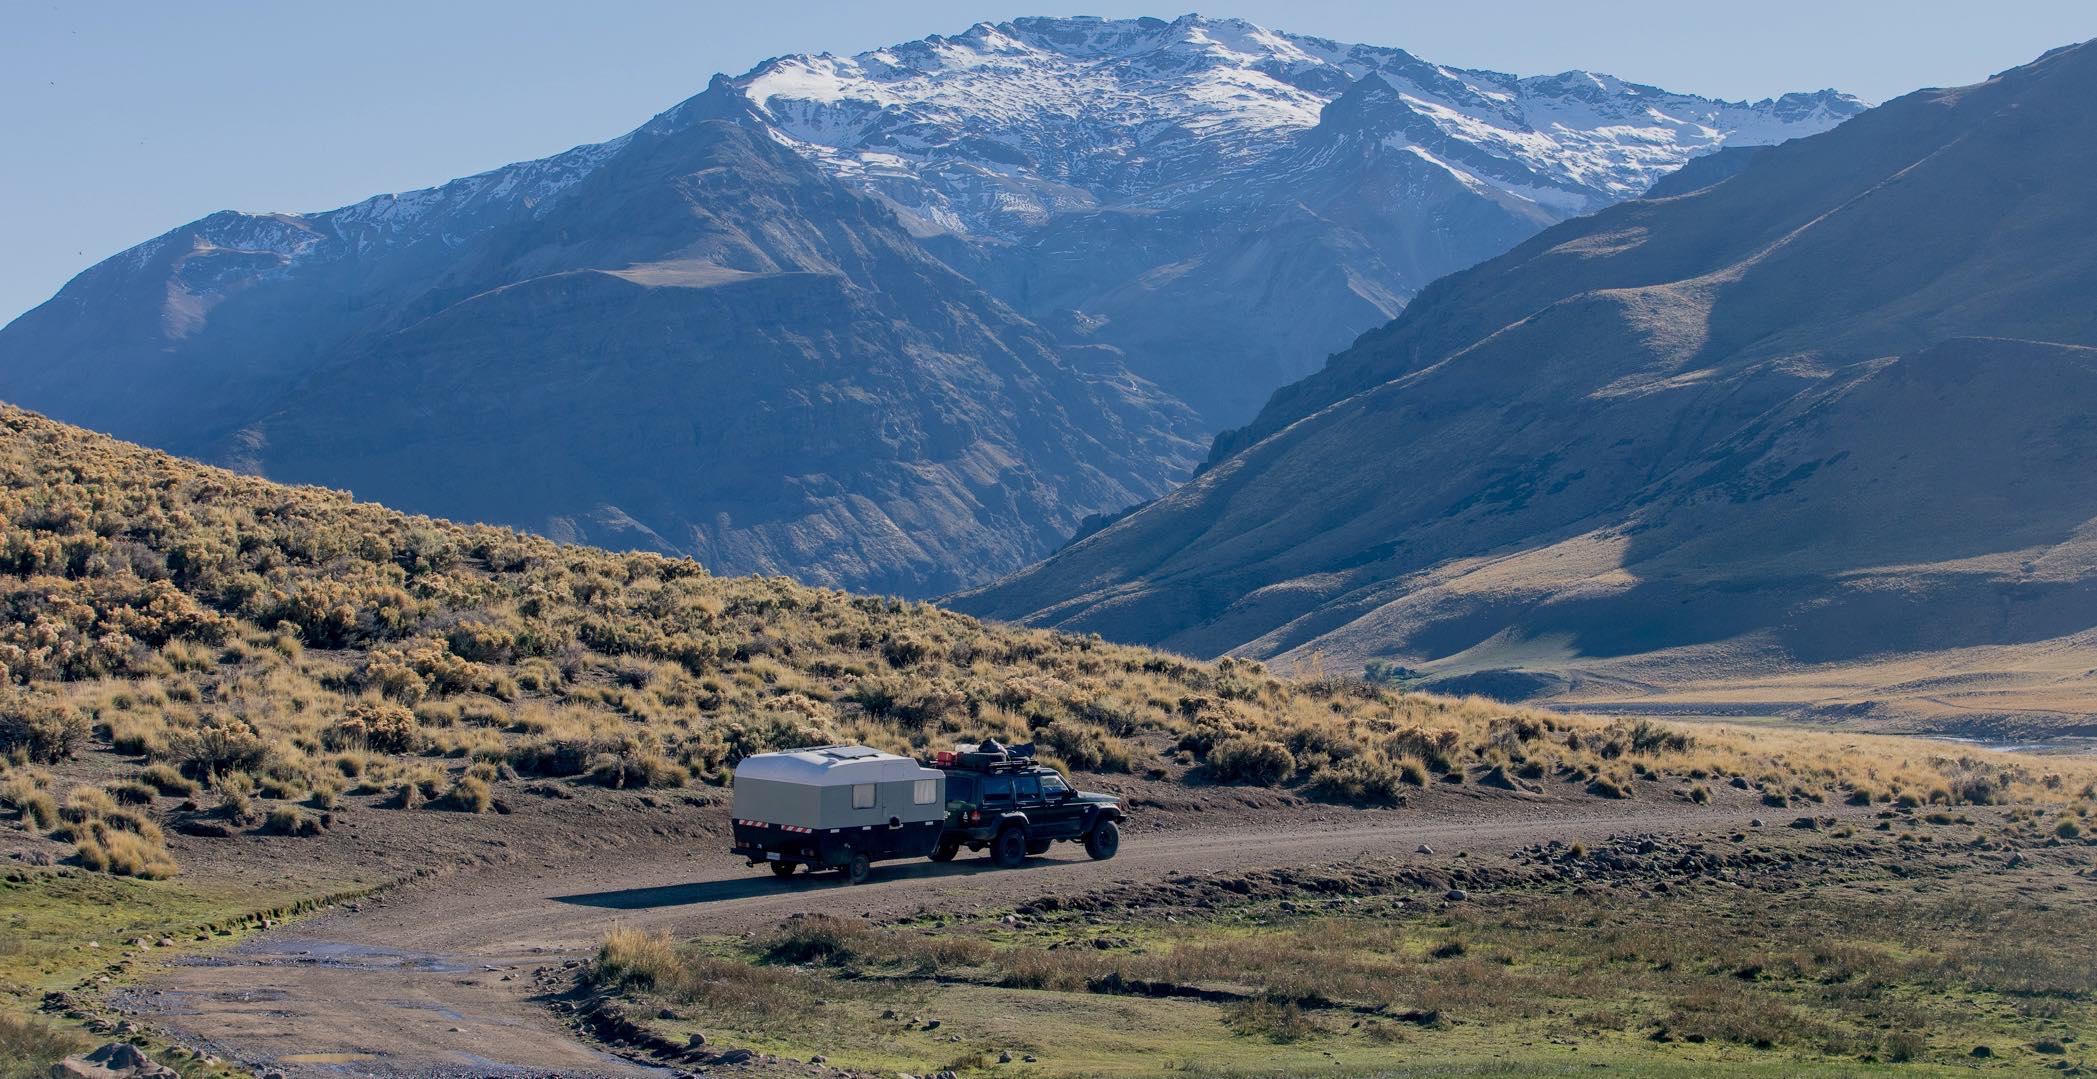 Family_roadtrip_in_Argentina_Chile_Uruguay.jpg